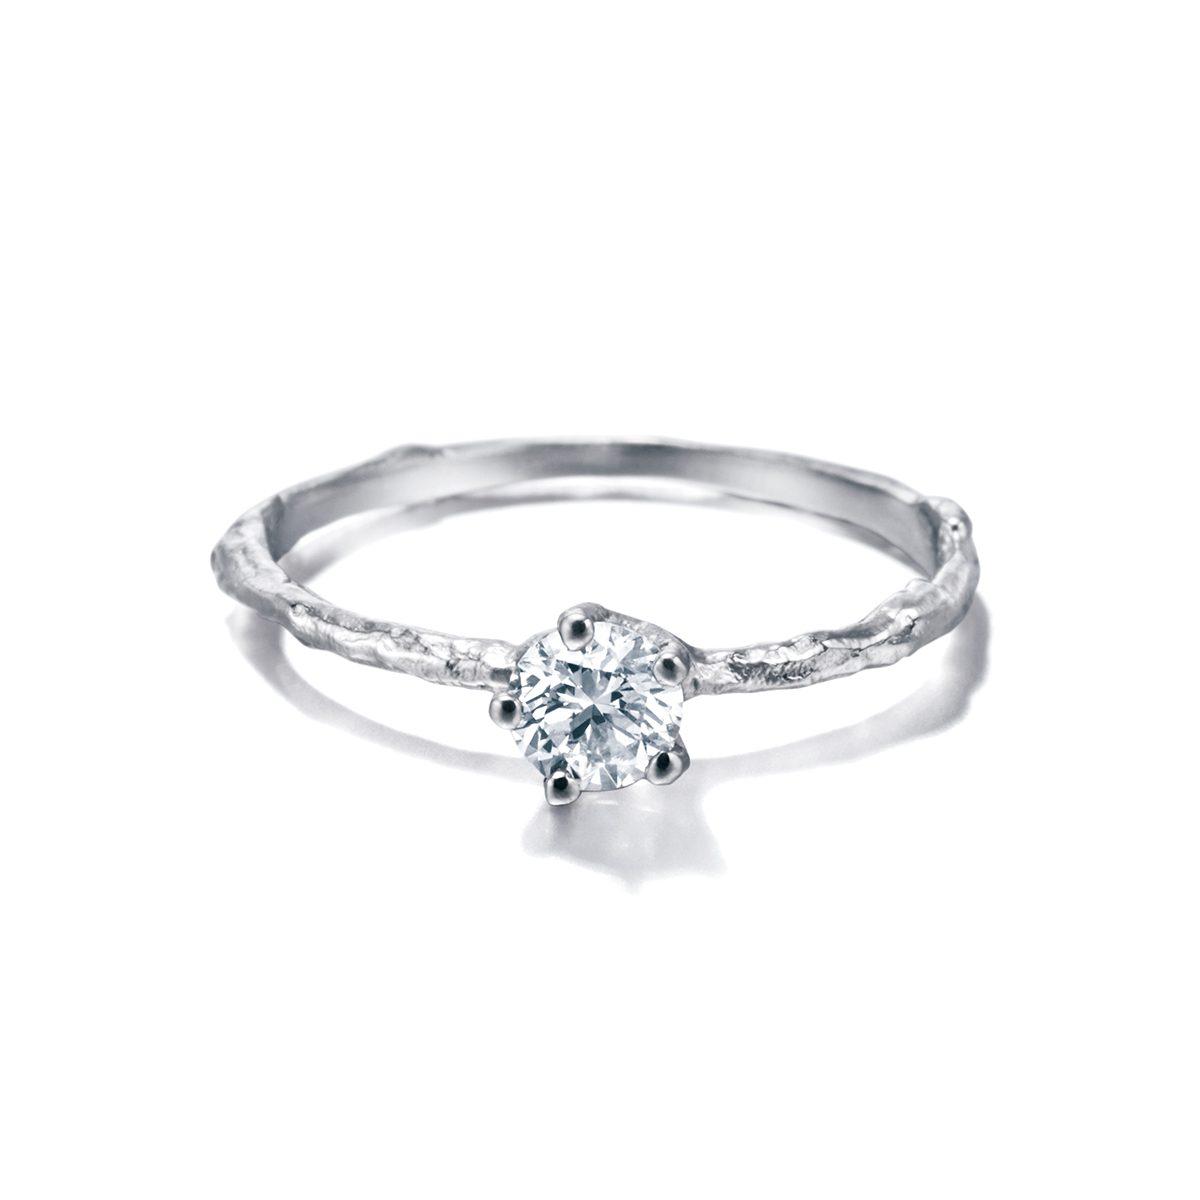 ALEX MONROE Eyebright|Engagement Rings